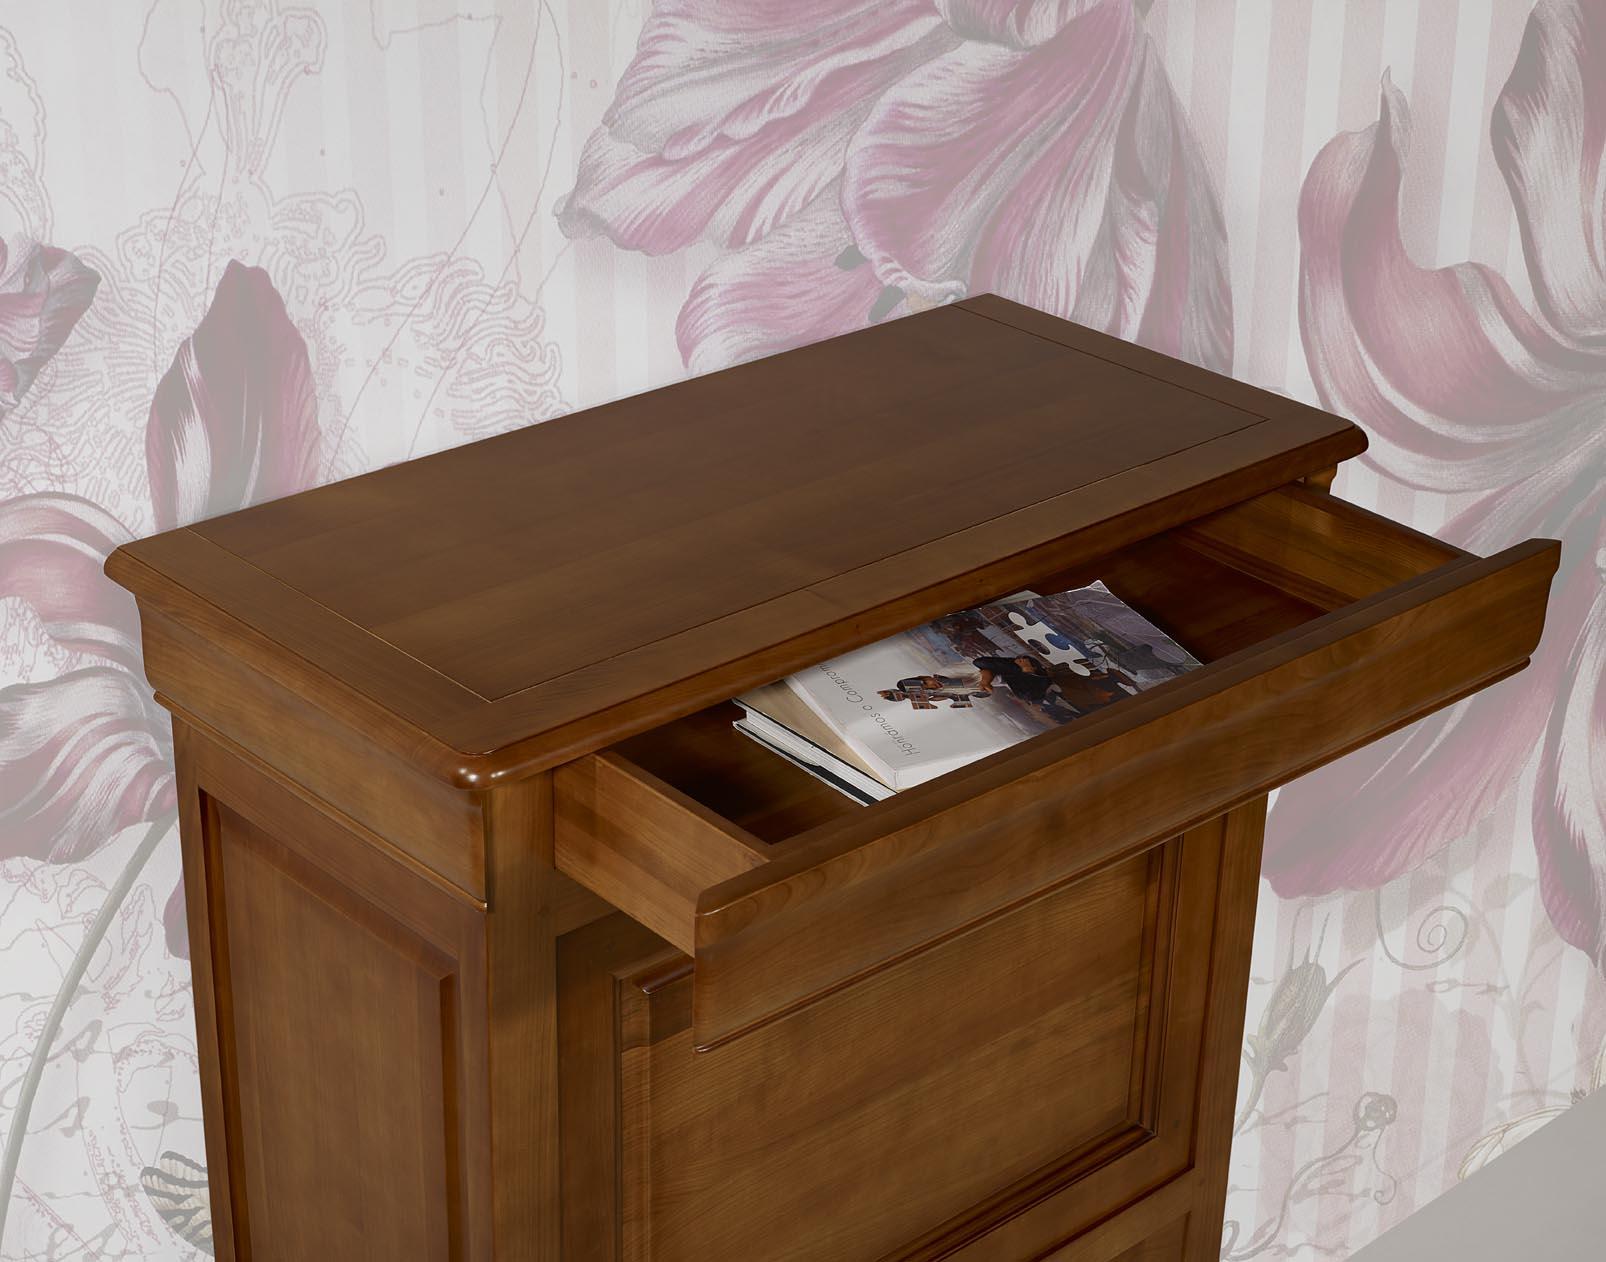 secr taire en merisier massif de style louis philippe meuble en merisier massif. Black Bedroom Furniture Sets. Home Design Ideas